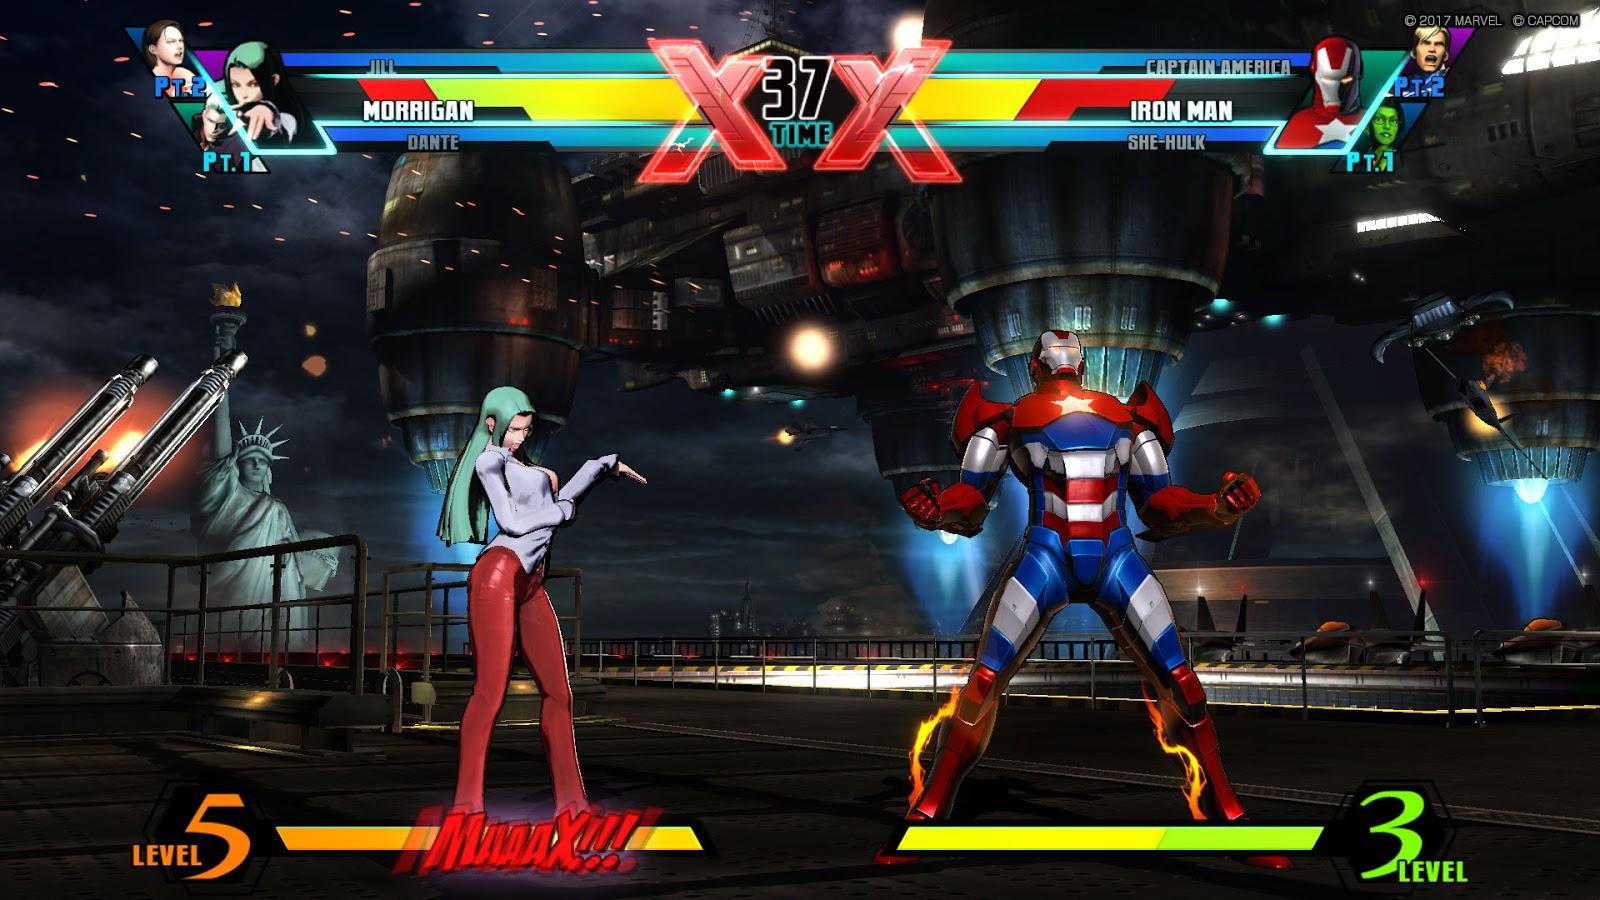 Ultimate Marvel vs Capcom 3 ESPAÑOL PC Descargar Full (CODEX) 4